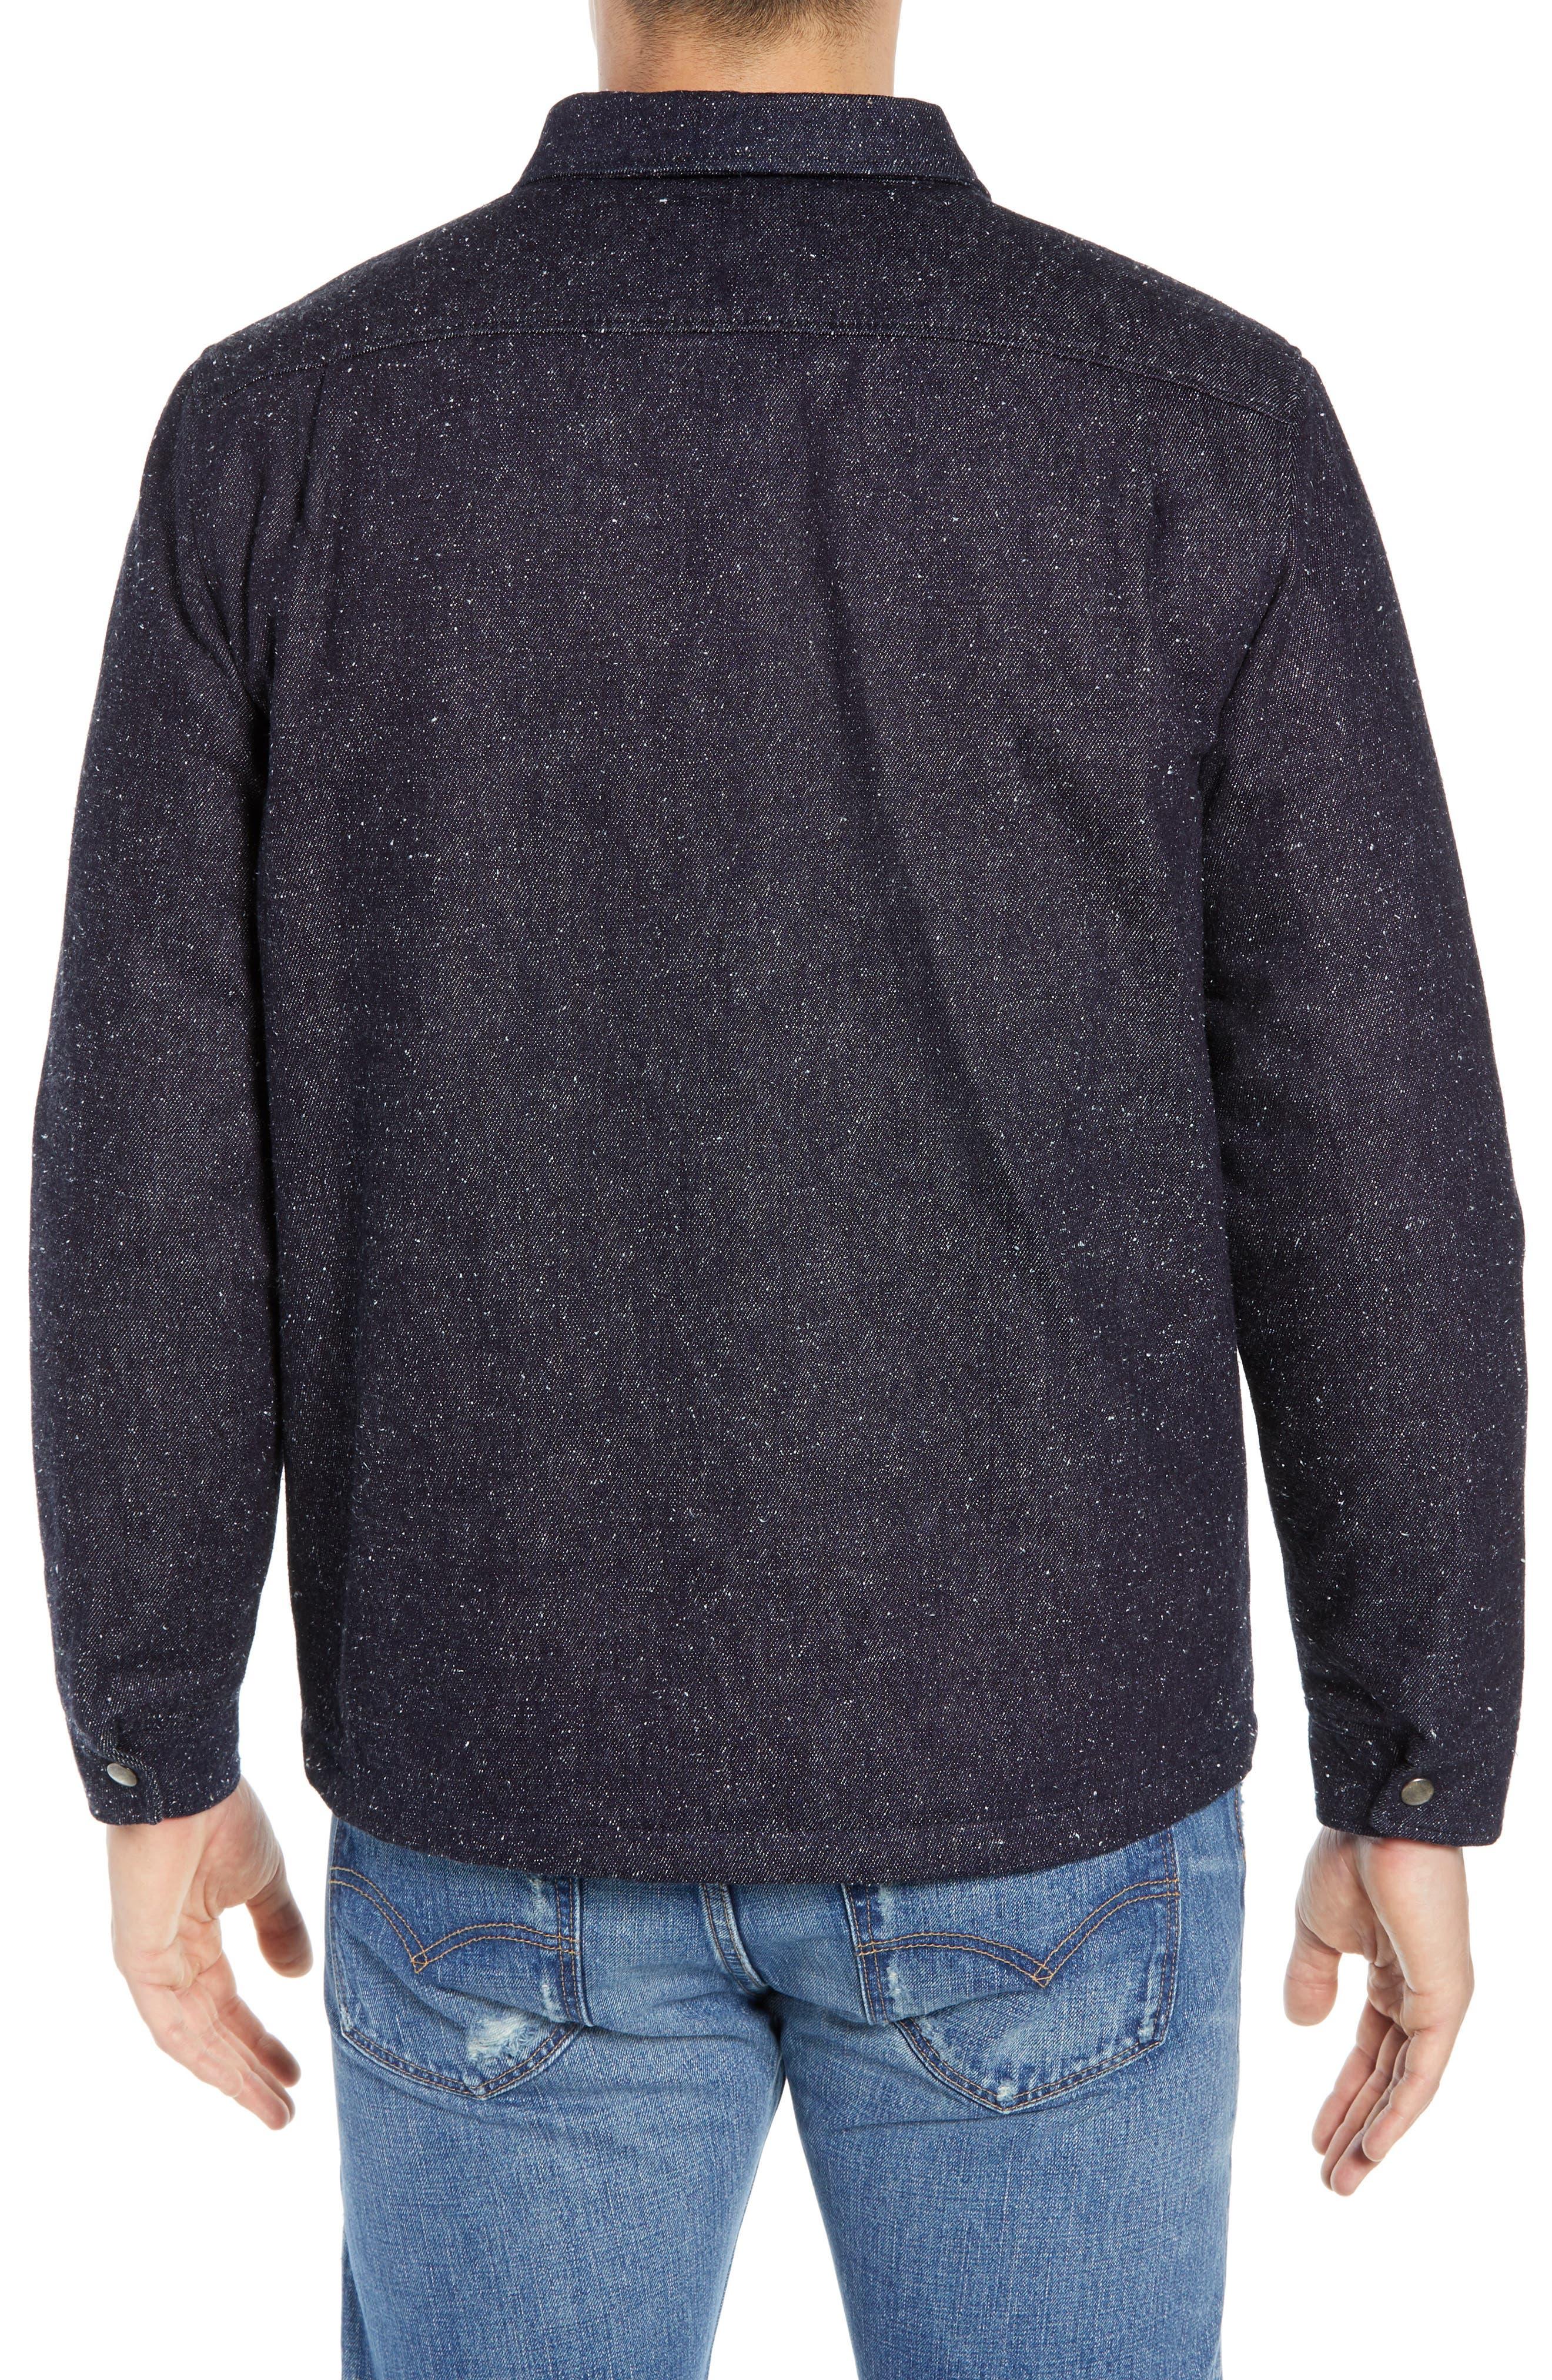 Nep Shirt Jacket,                             Alternate thumbnail 2, color,                             DENIM BLUES